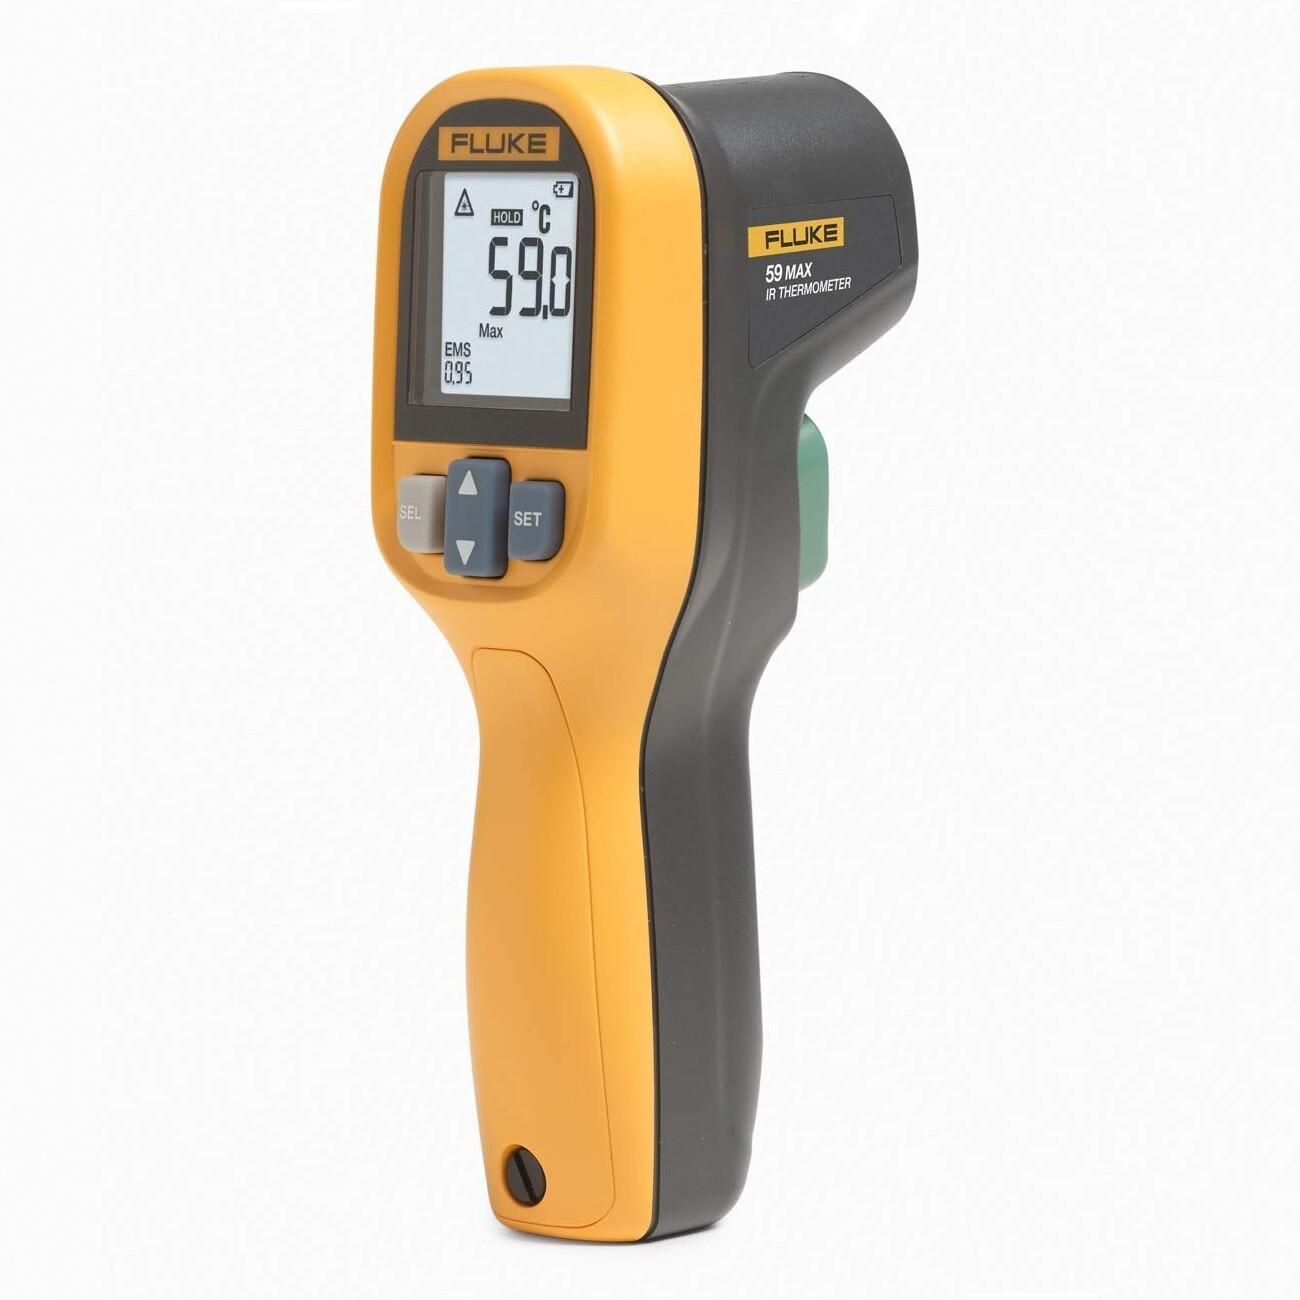 Fluke 59 MAX Infrared Thermometer -30 DegC to 350 DegC